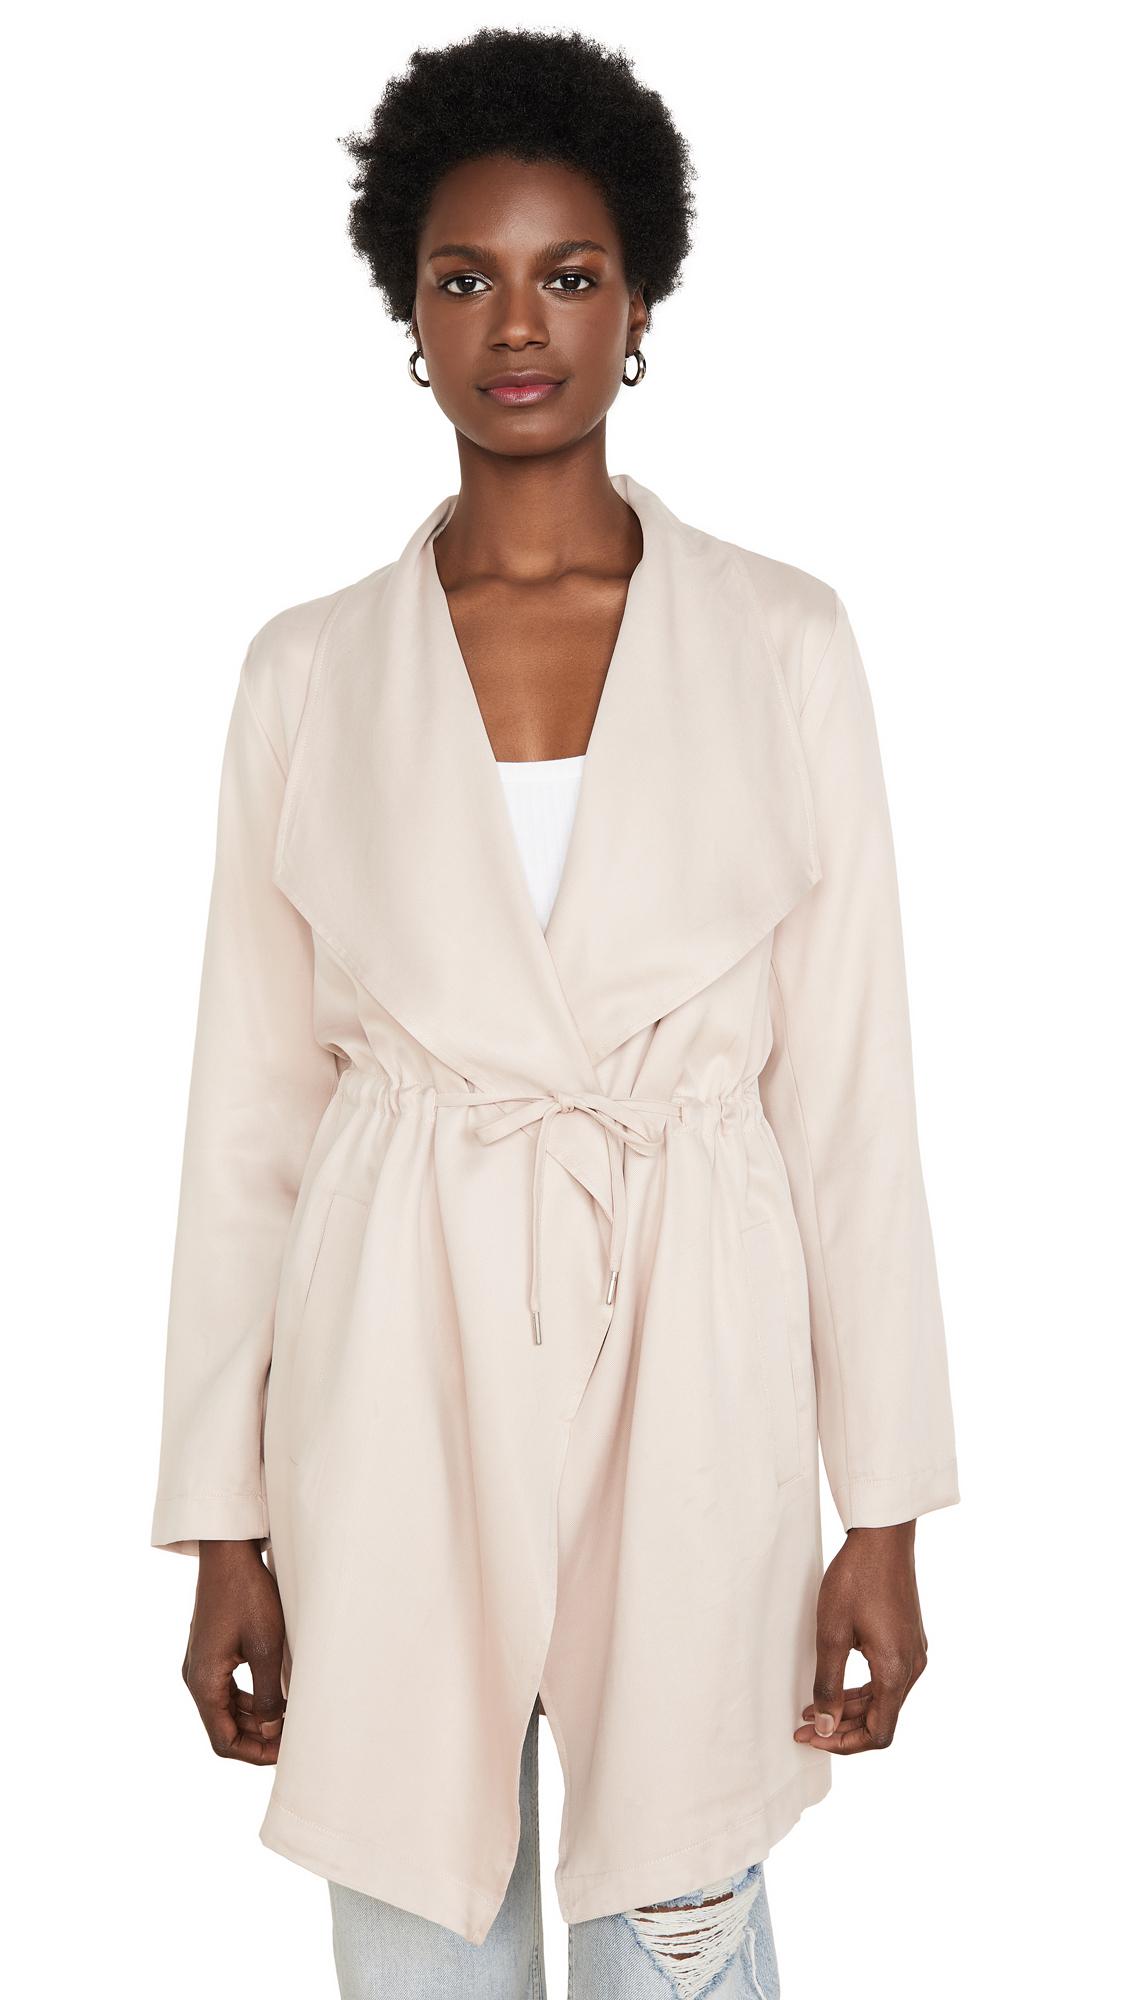 Buy BB Dakota Let It Rain Trench Coat online beautiful BB Dakota Jackets, Coats, Trench Coats